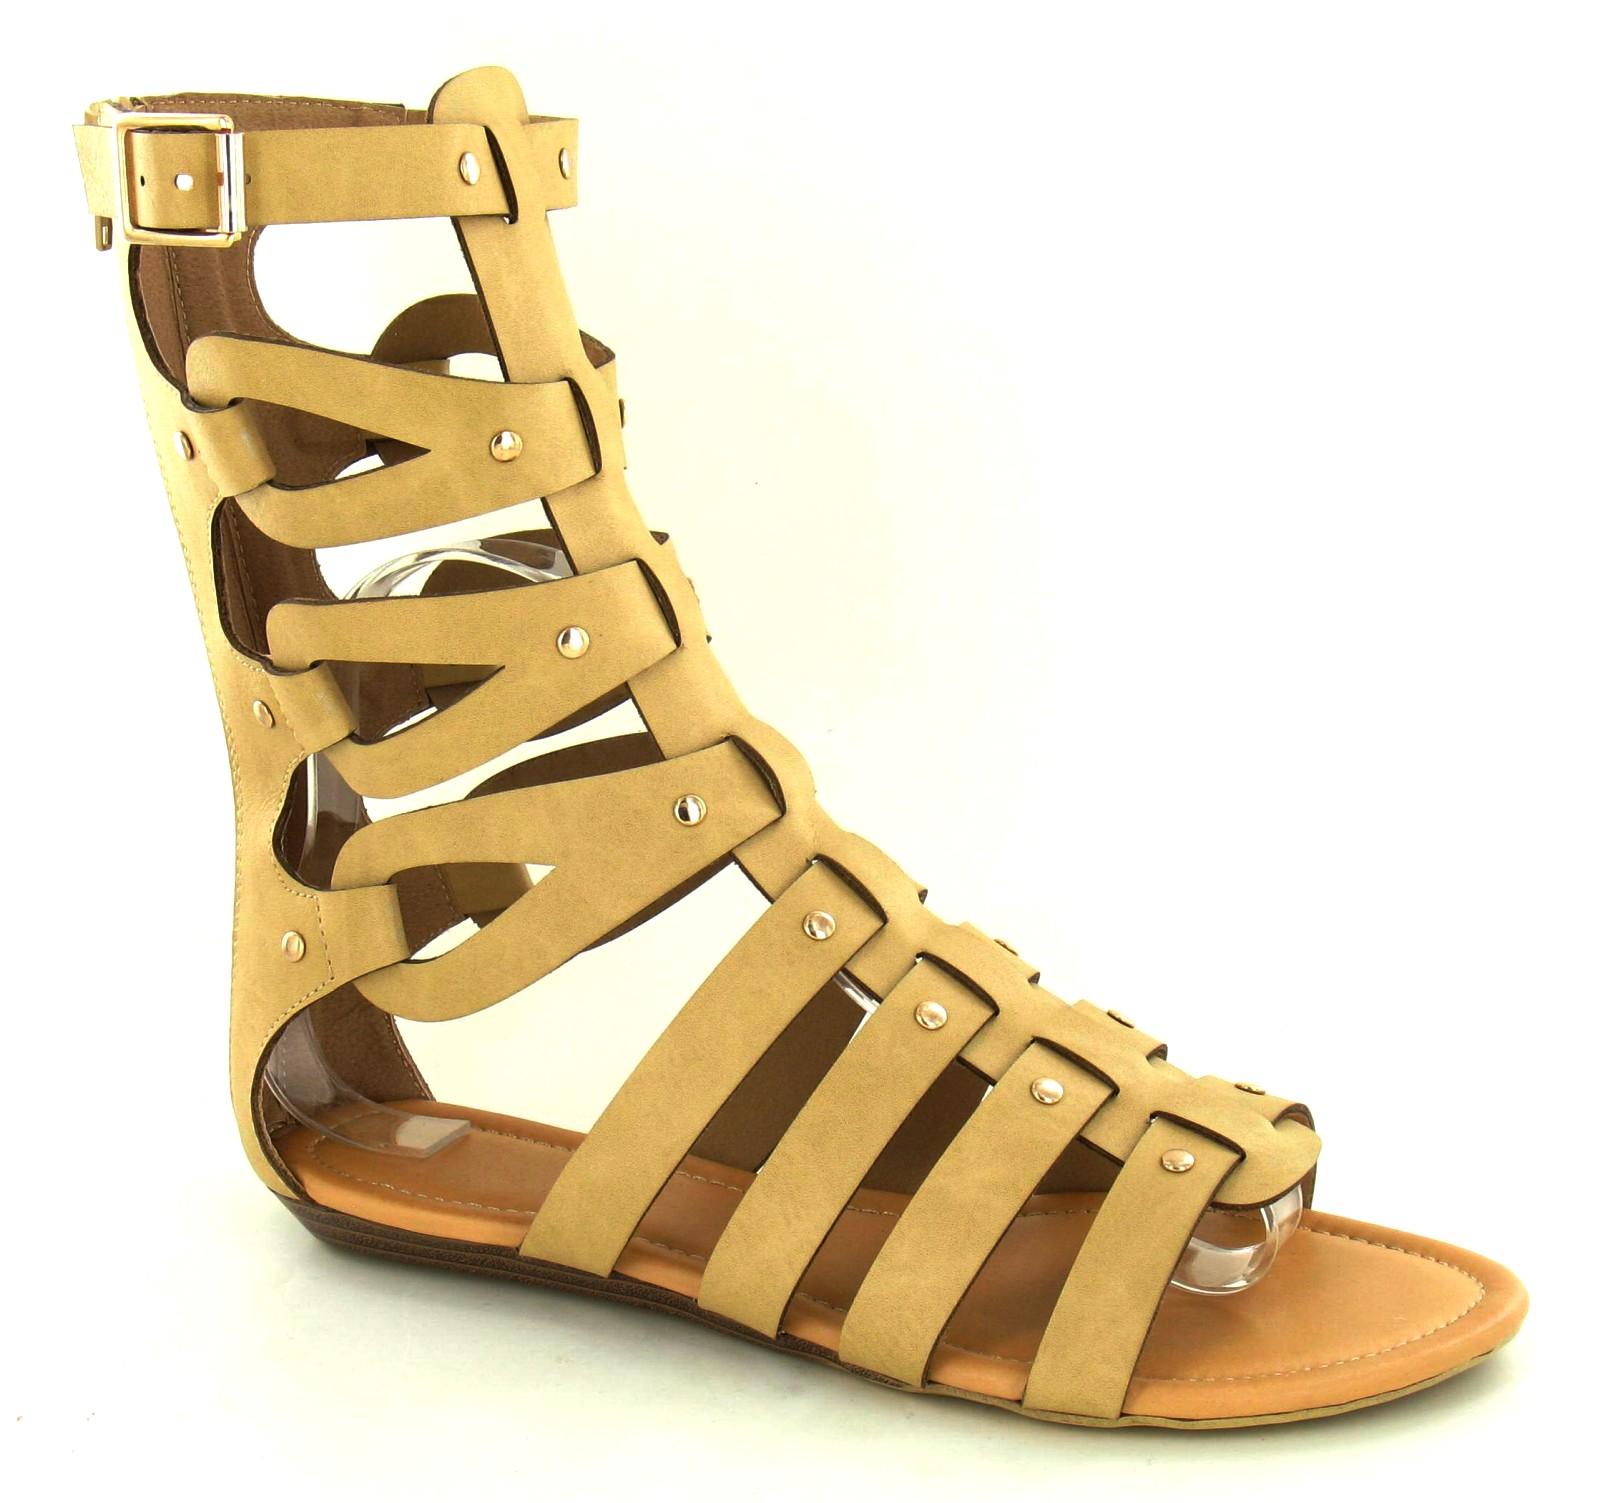 womens mid calf cut out flat gladiator sandals ladies summer shoes size uk 3 8 ebay. Black Bedroom Furniture Sets. Home Design Ideas